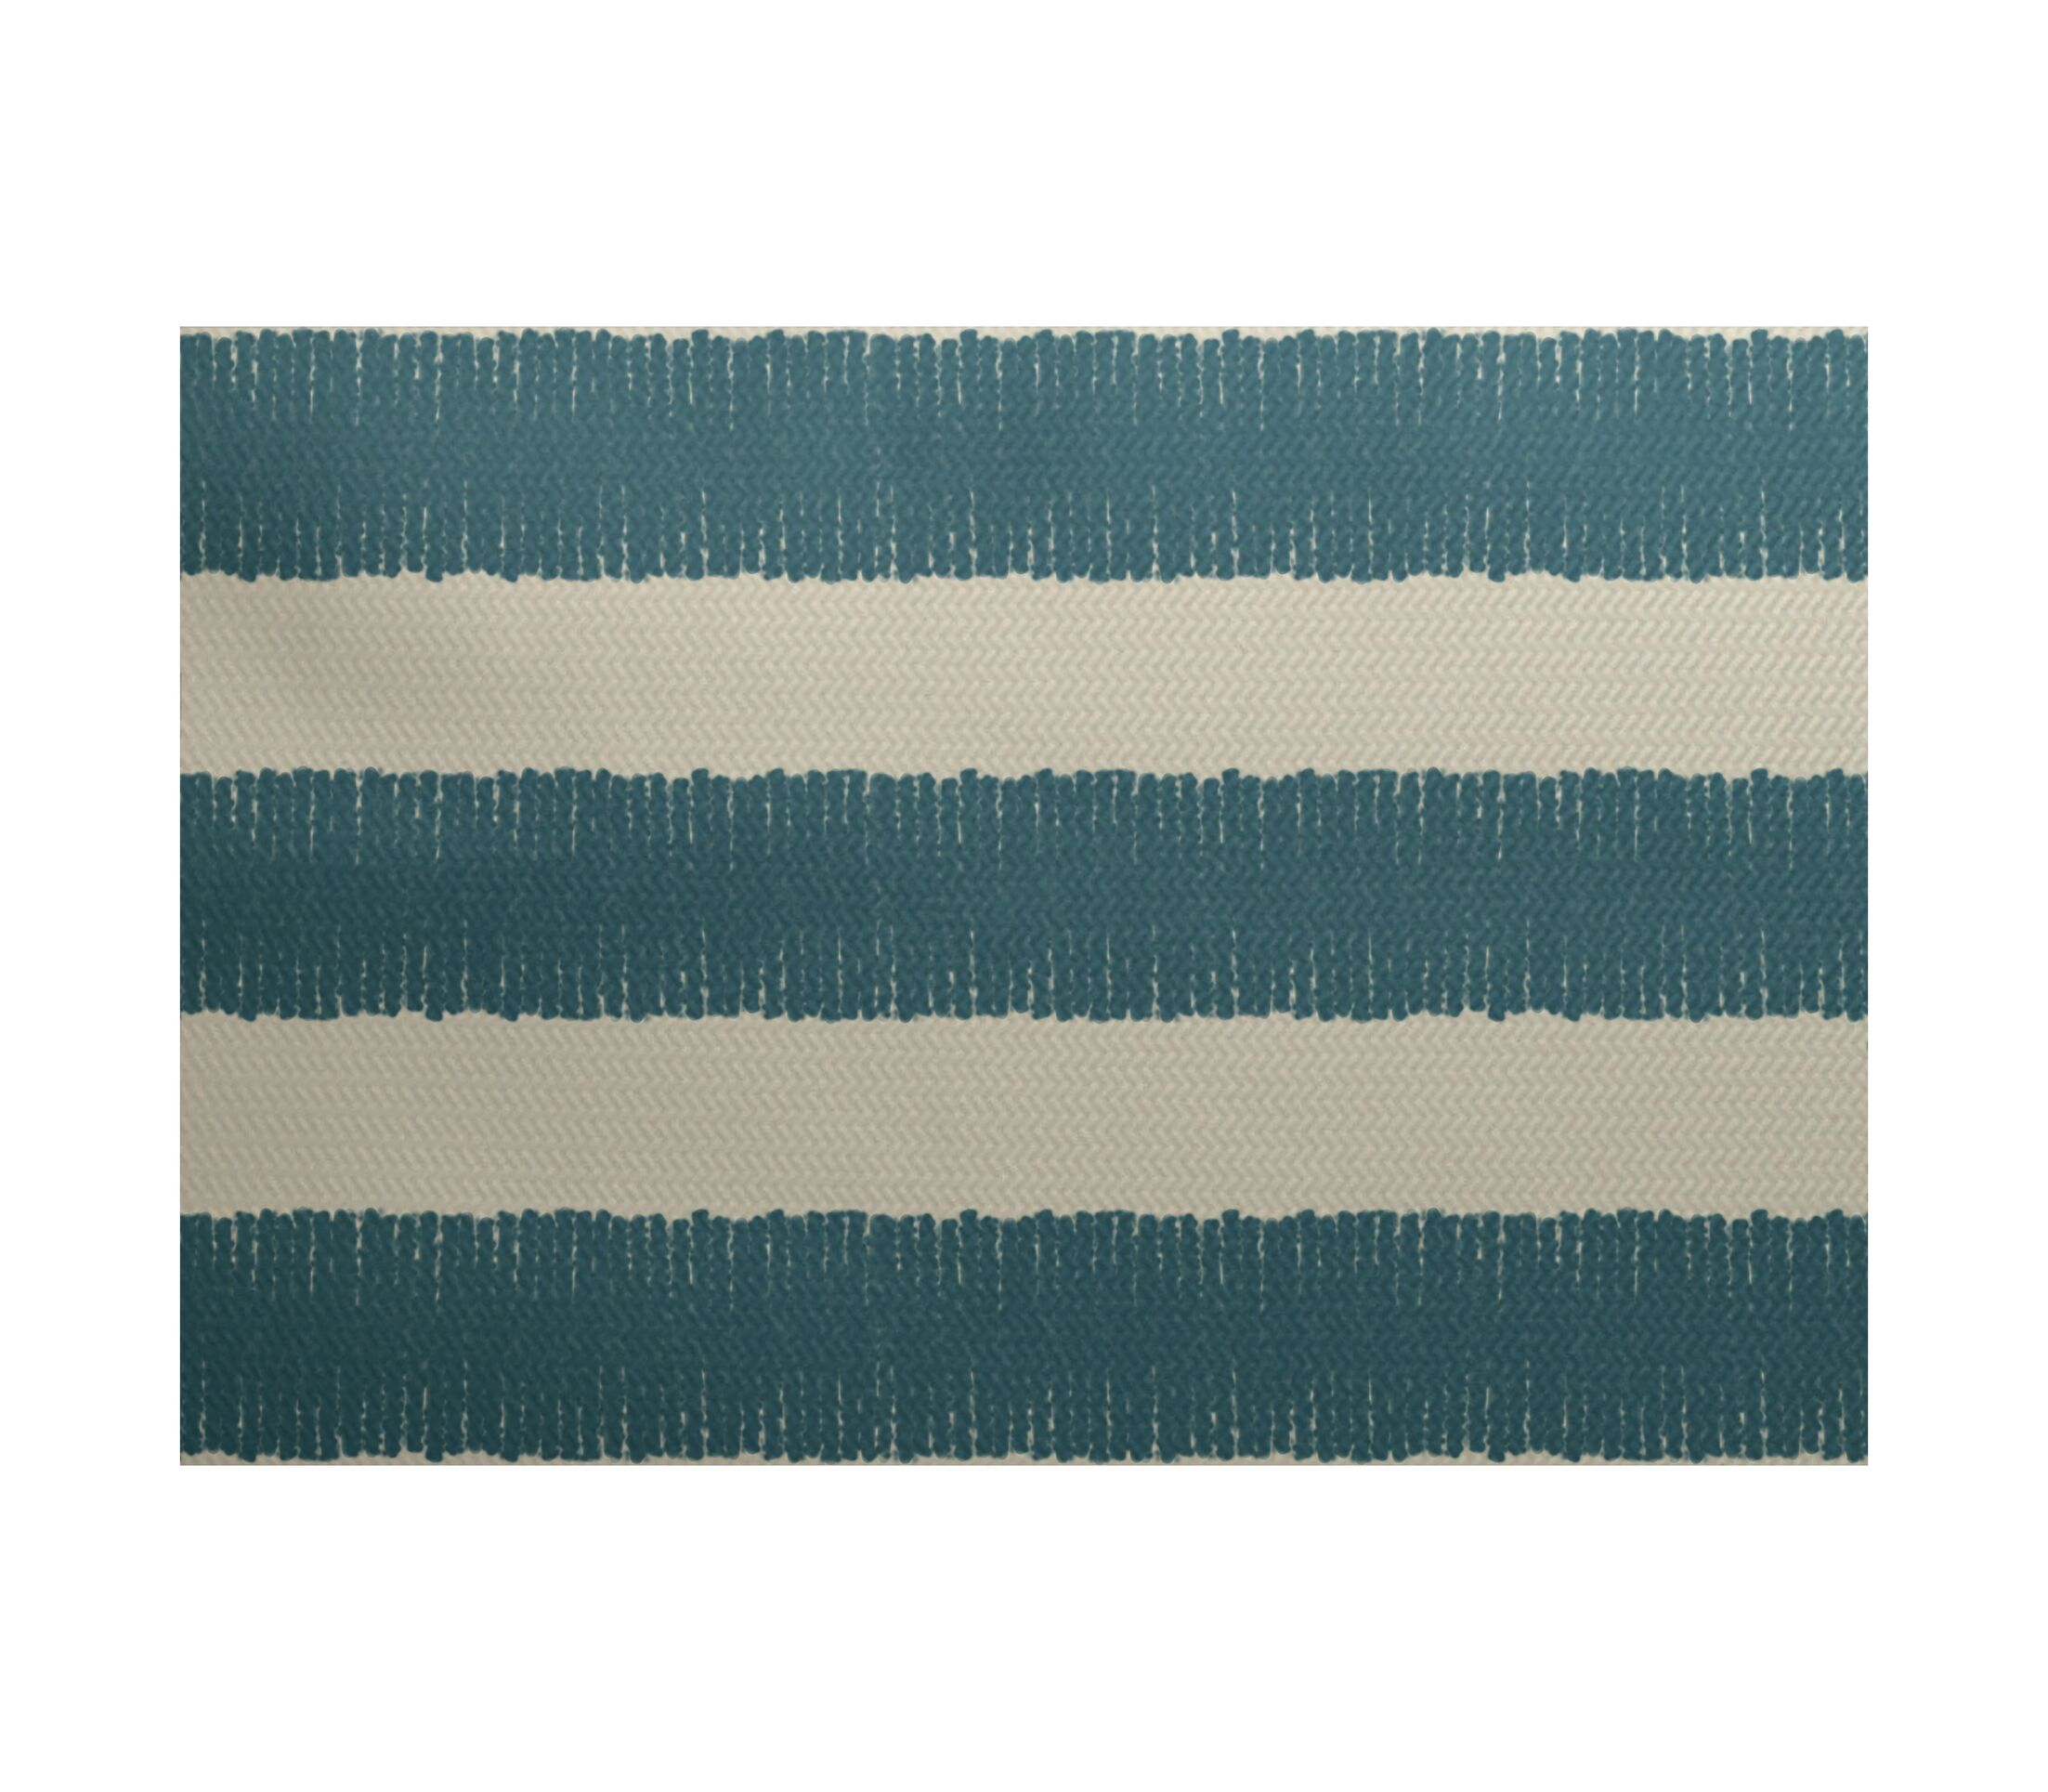 Leann Twisted Stripe Print Aqua Indoor/Outdoor Area Rug Rug Size: Rectangle 3' x 5'